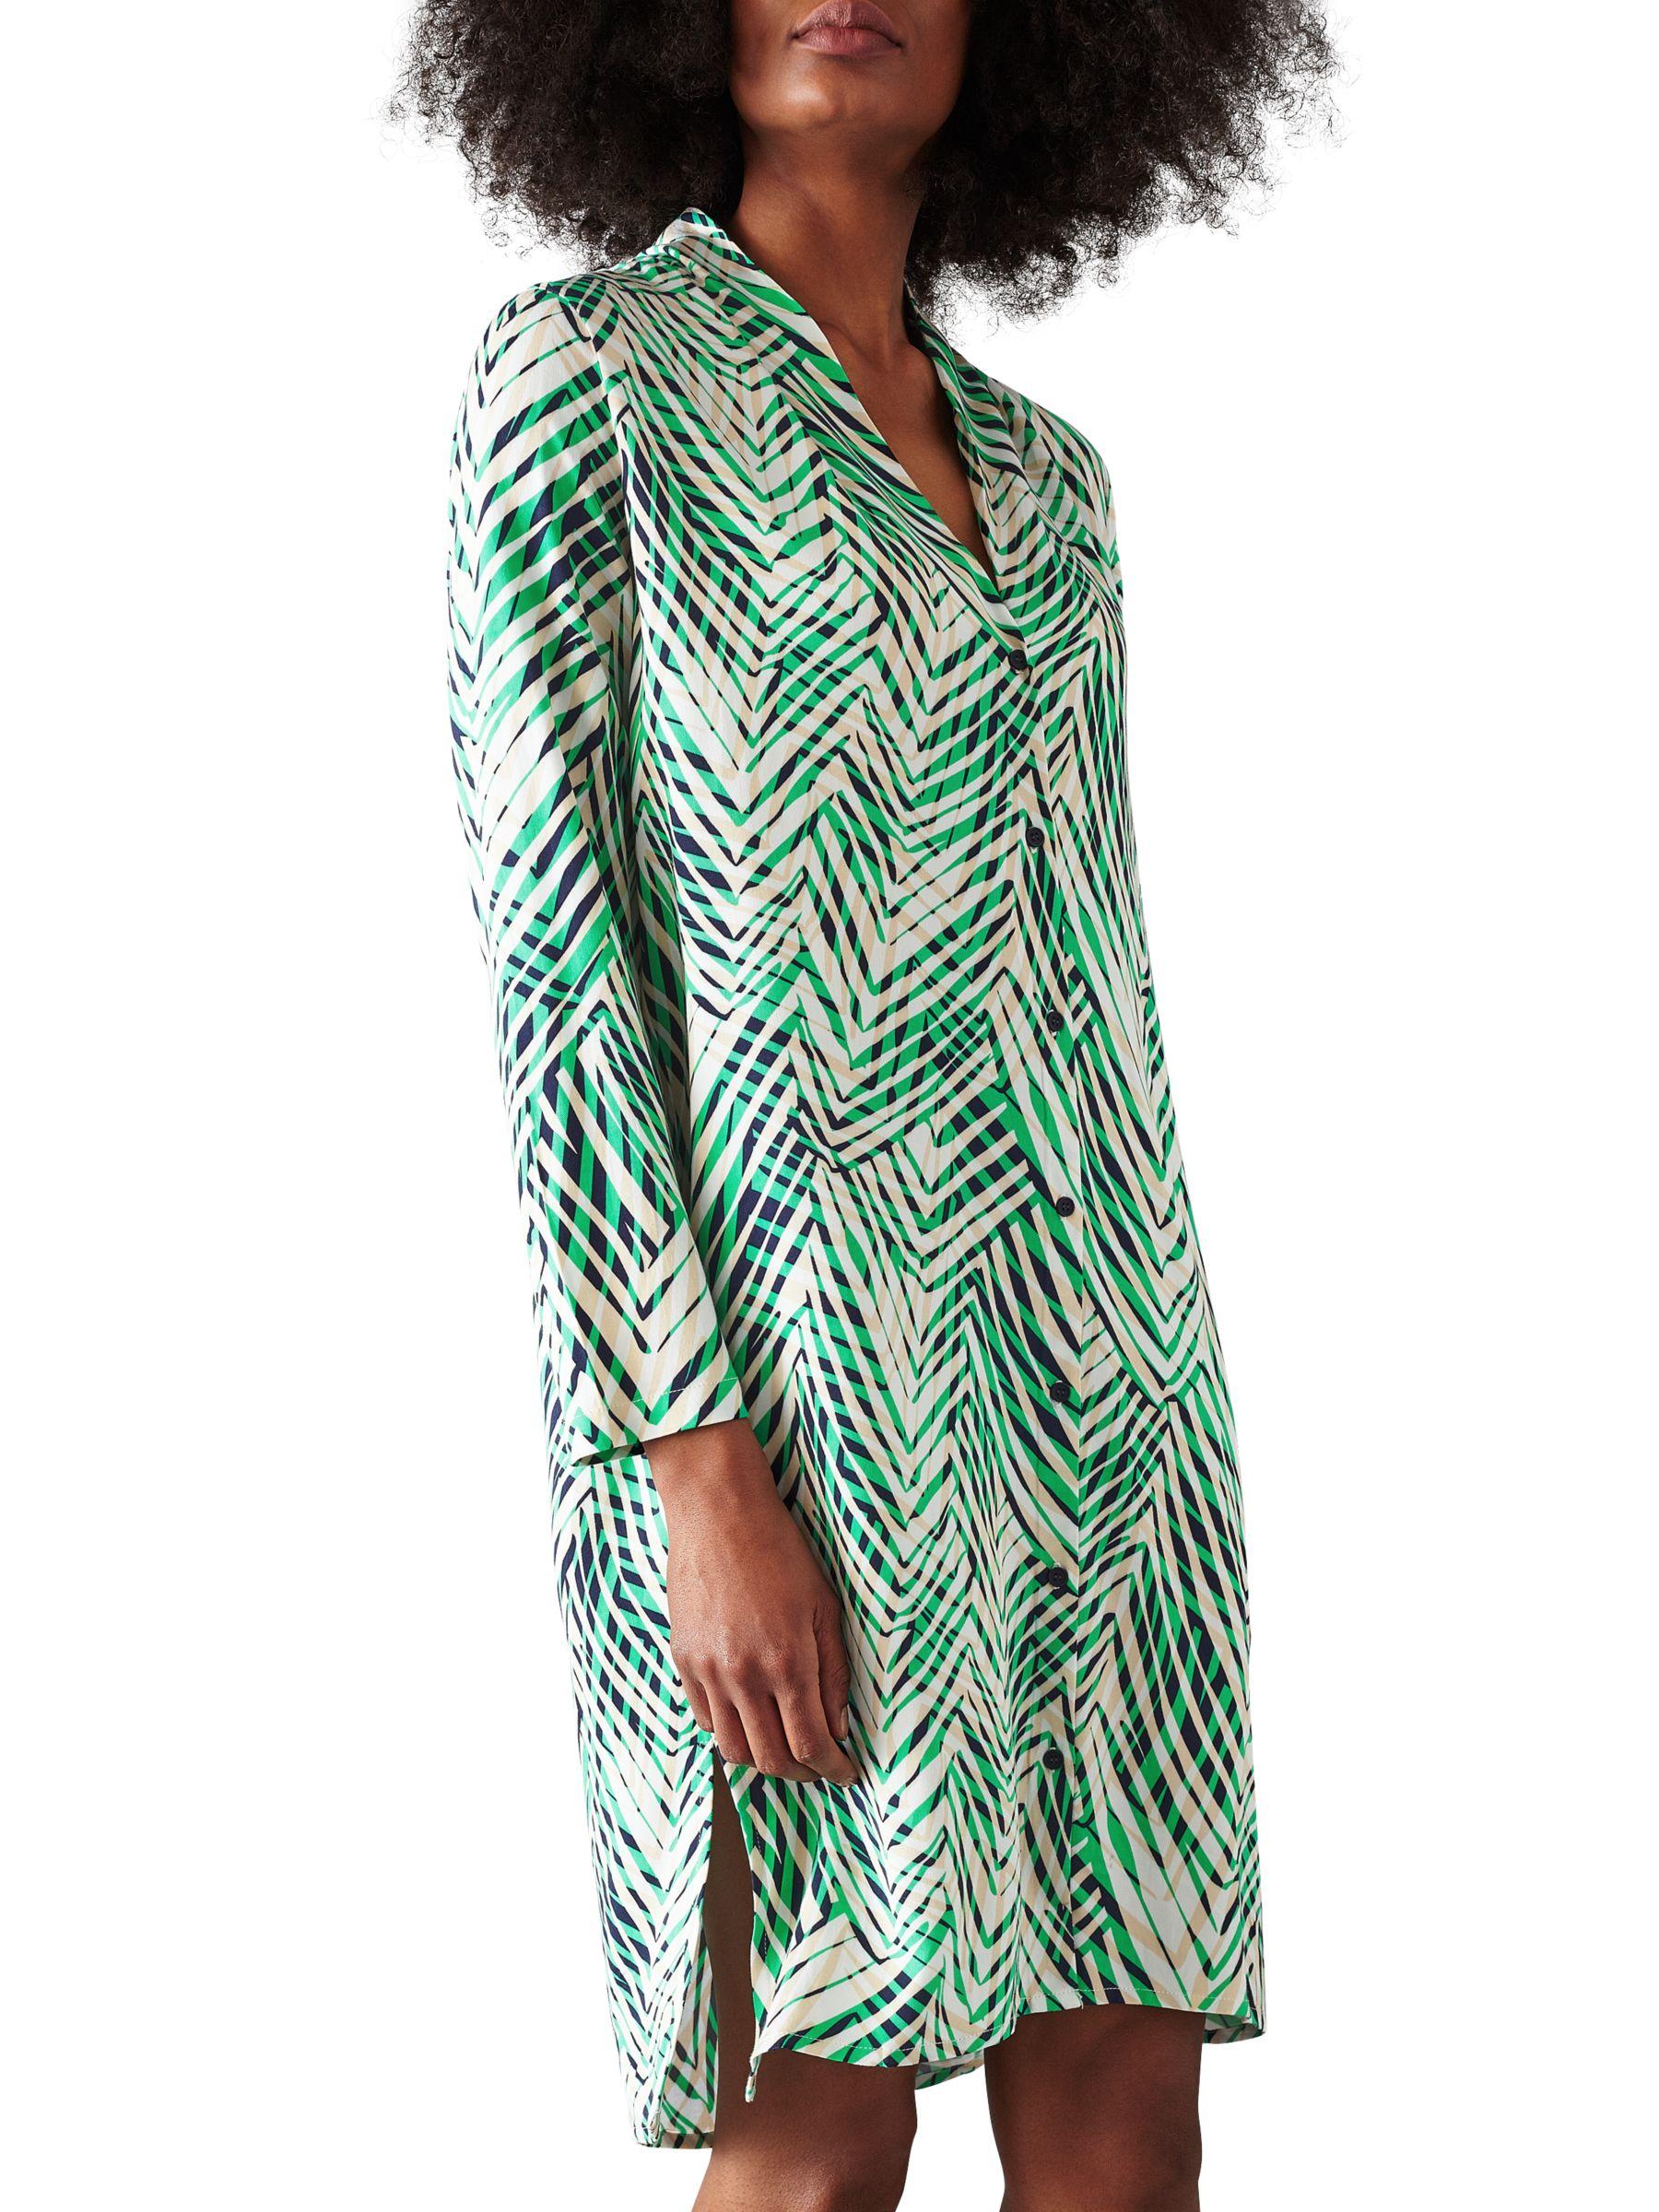 Minimum Minimum Katina Dress, Paris Green